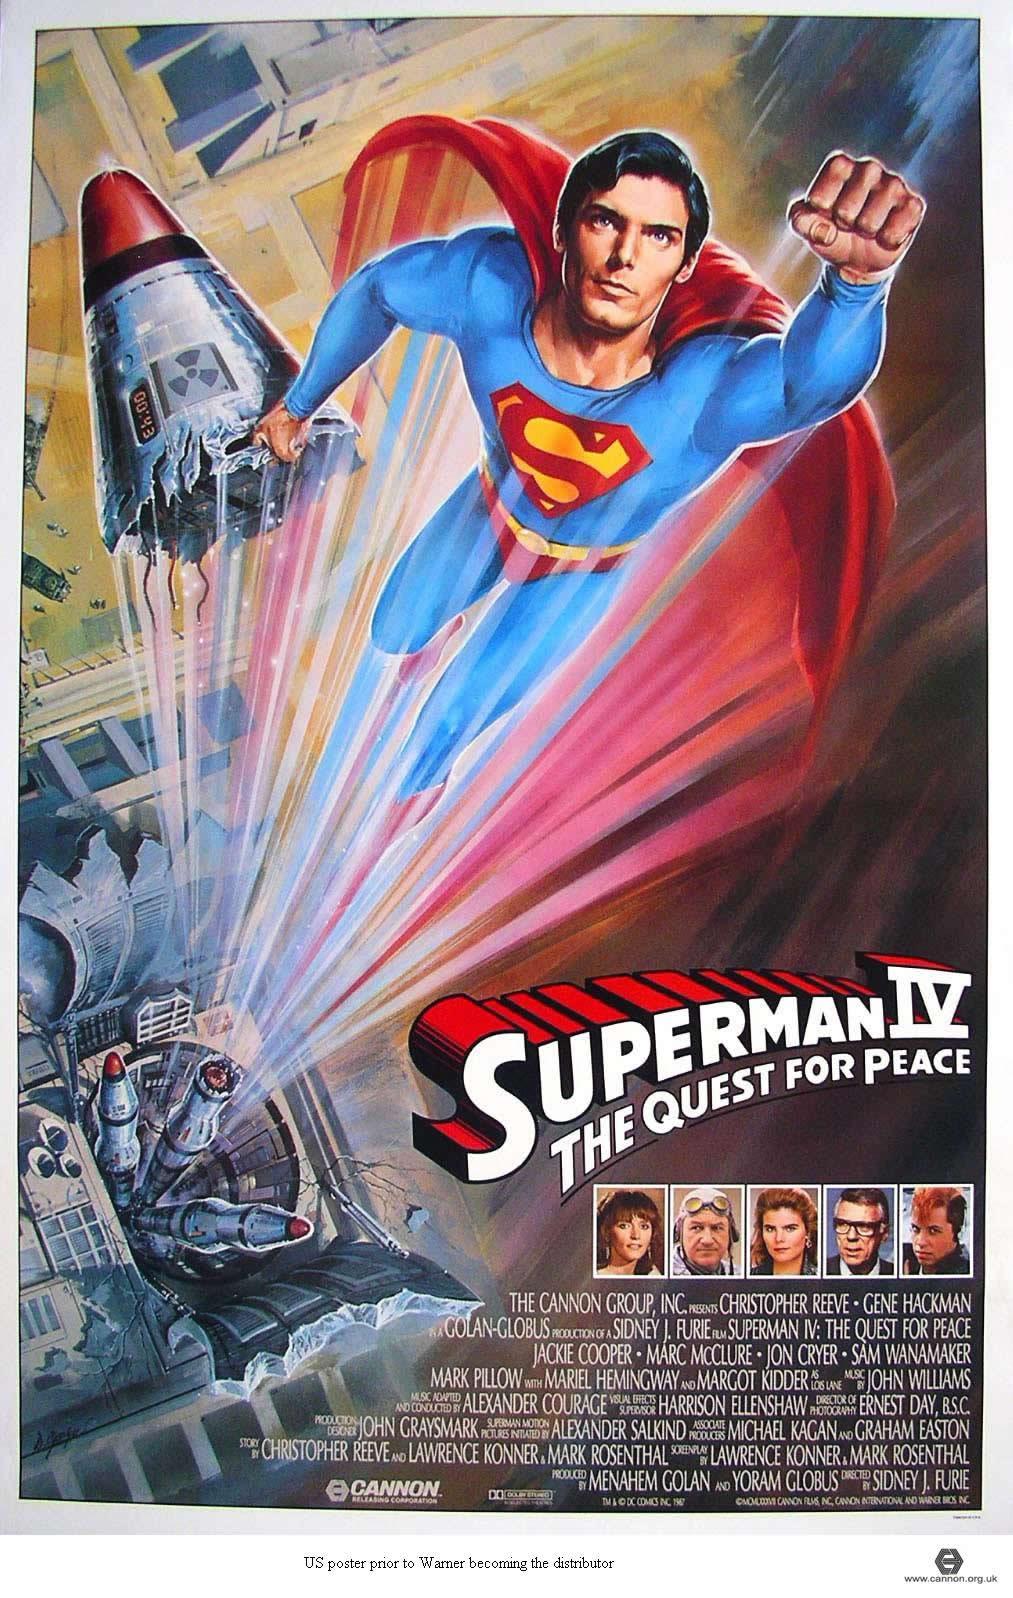 https://i0.wp.com/braindamaged.fr/wp-content/uploads/2013/06/superman-iv-the-quest-for-peace-1987.jpg